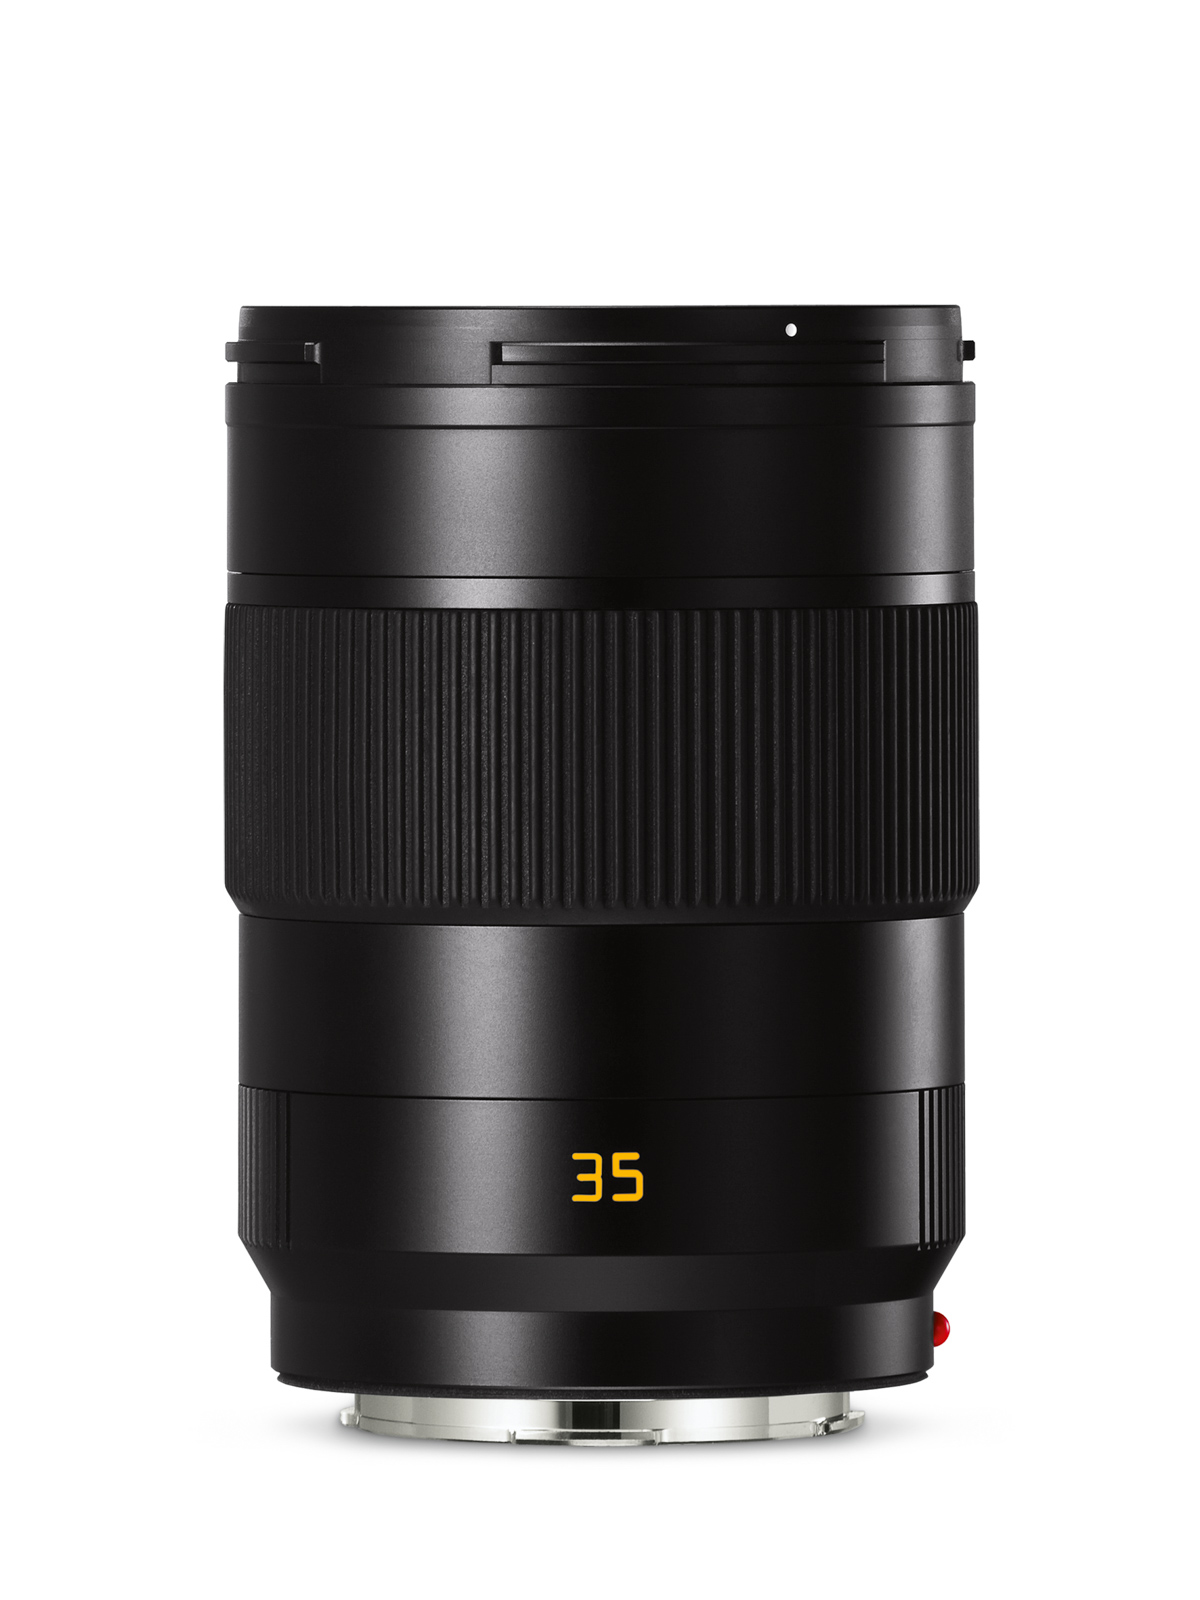 Leica APO-Summicron-SL 2.0/35 ASPH